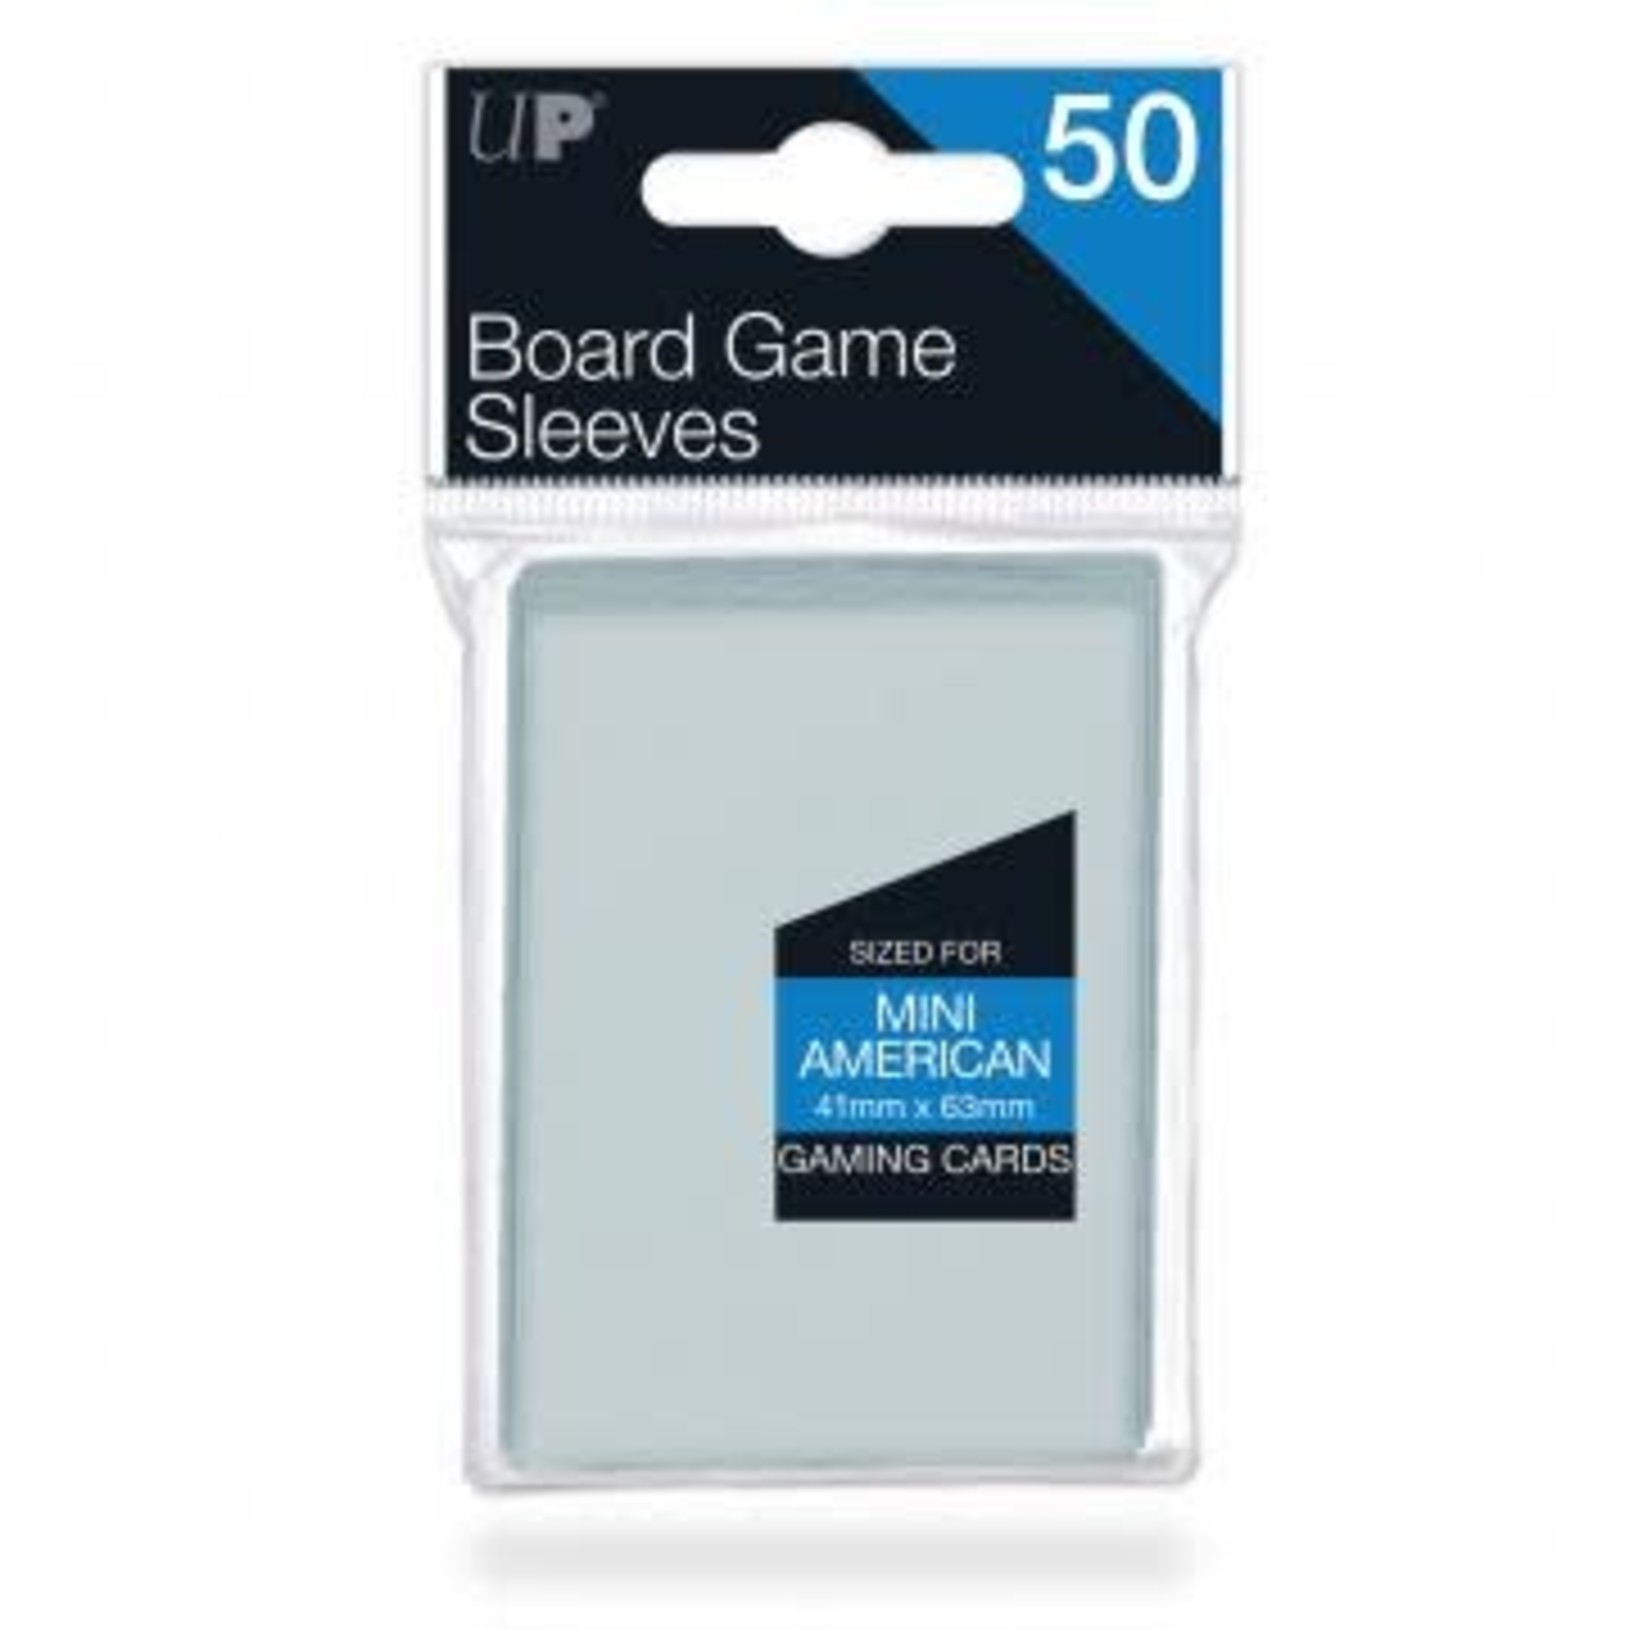 Ultra Pro Ultra Pro Mini American Card Sleeves